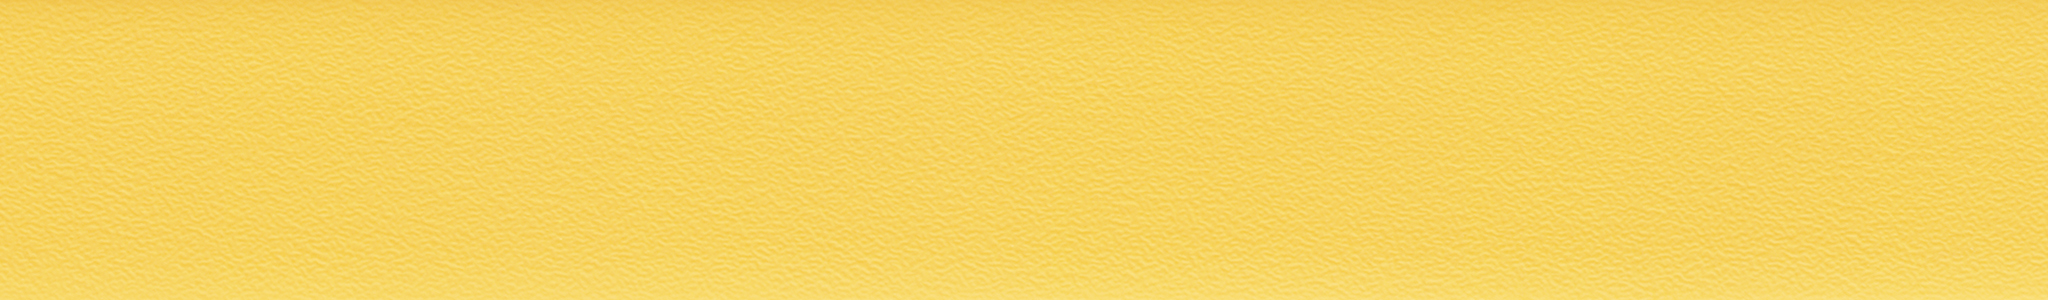 HU 111510 ABS-rand saffraangeel parel 101